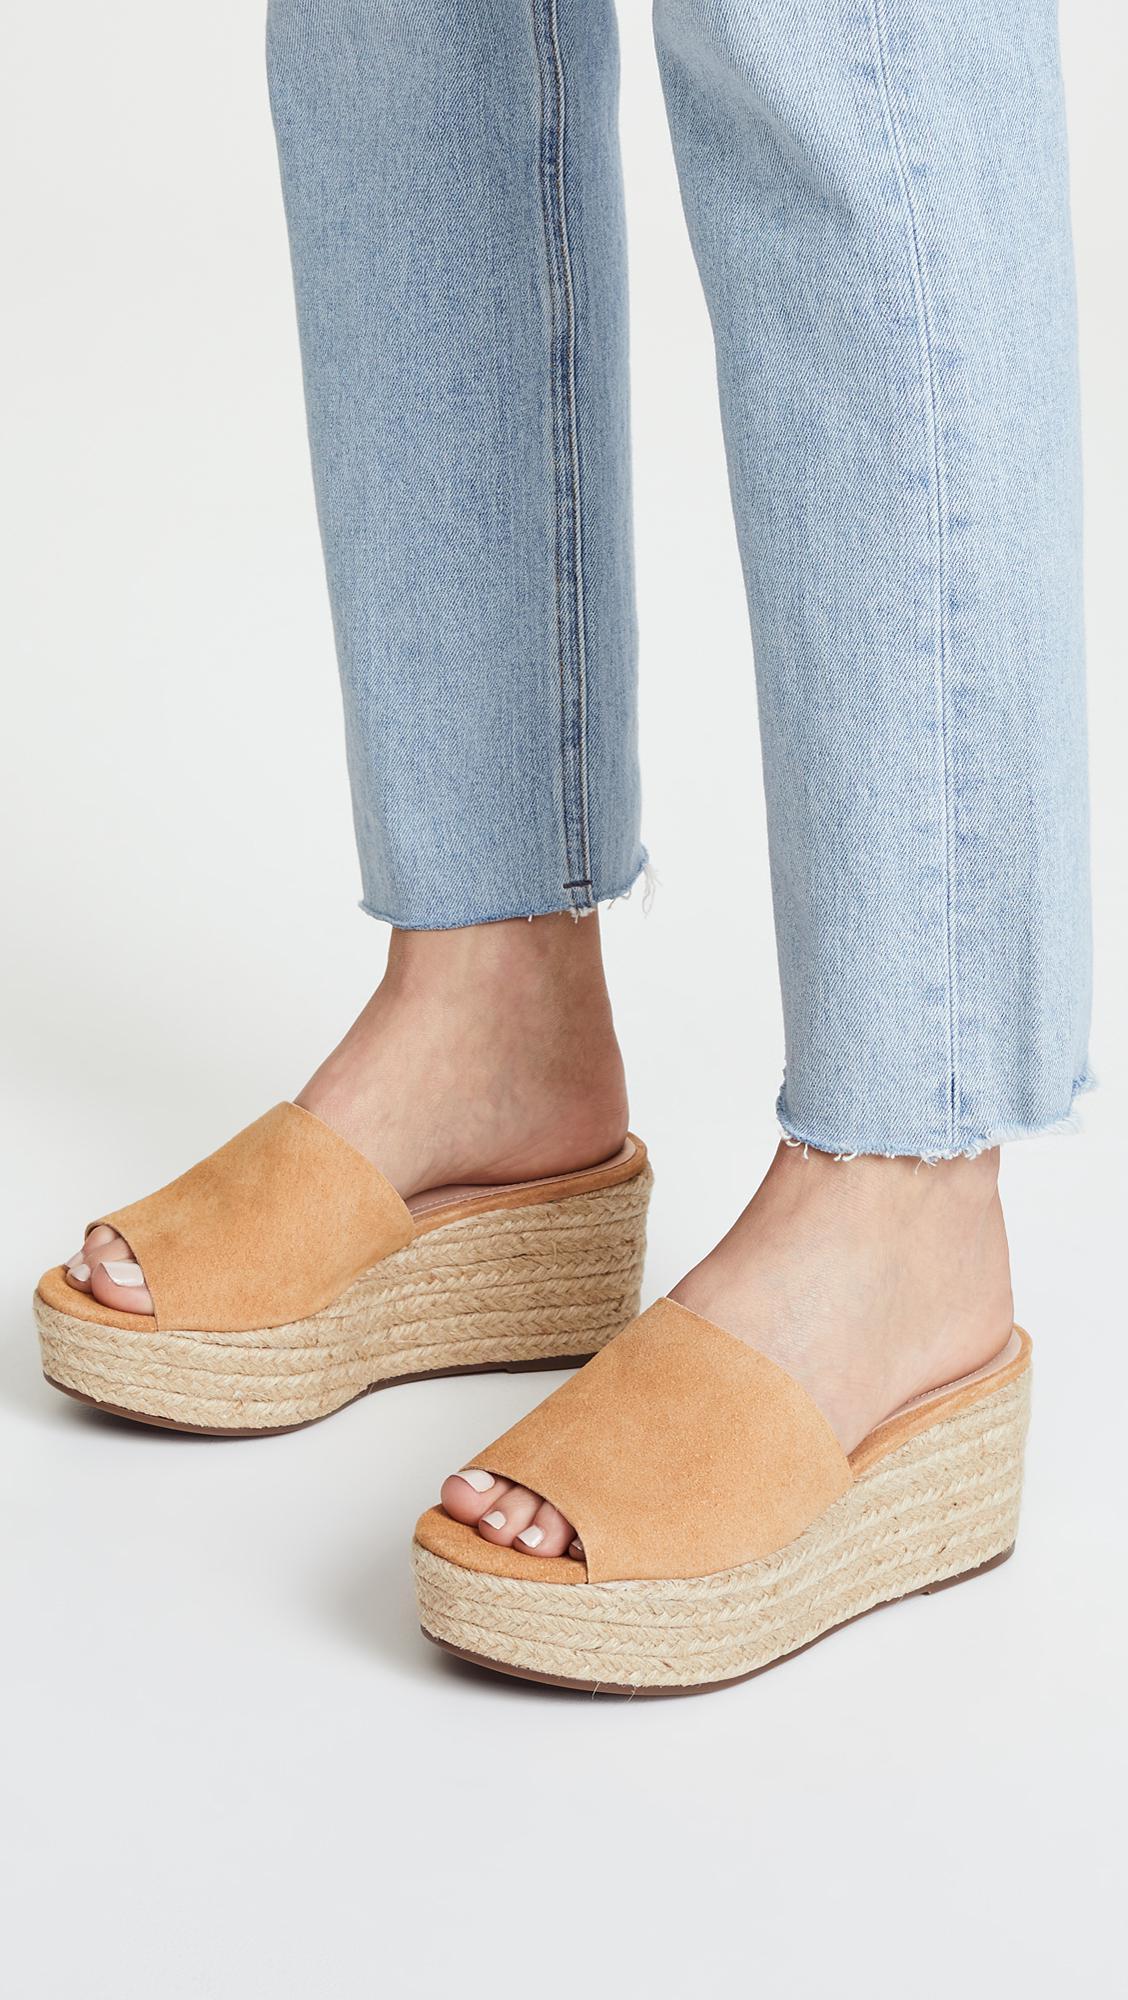 466112e1190d1 Schutz Multicolor Thalia Flatform Sandals